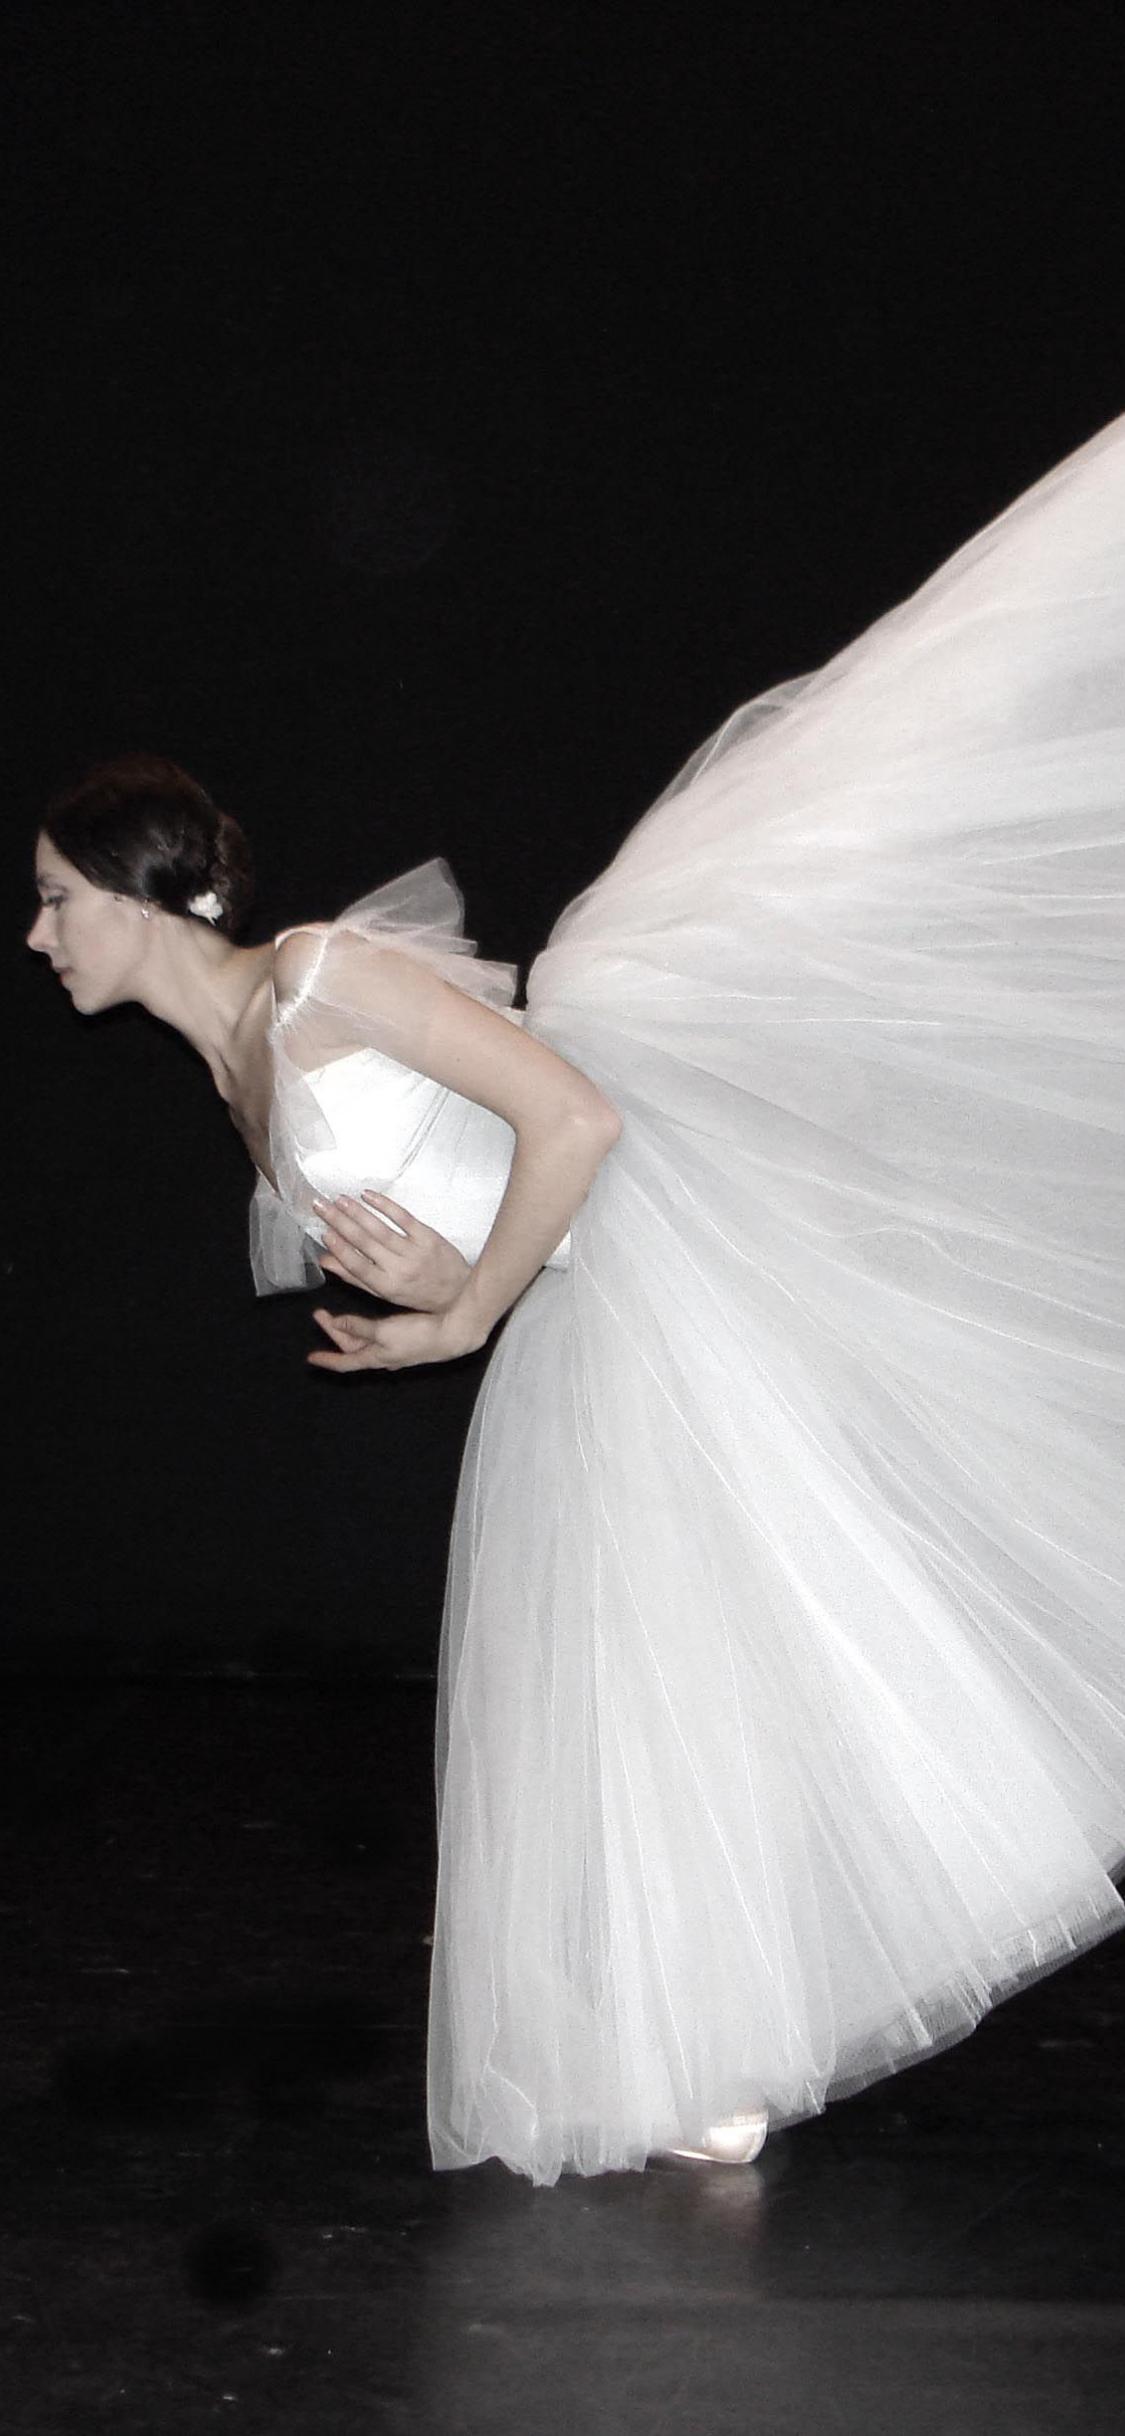 Free Download Ballet Giselle Dancers Iphone 5 Wallpaper Dance Images 3264x2448 For Your Desktop Mobile Tablet Explore 31 Giselle Wallpaper Giselle Wallpaper